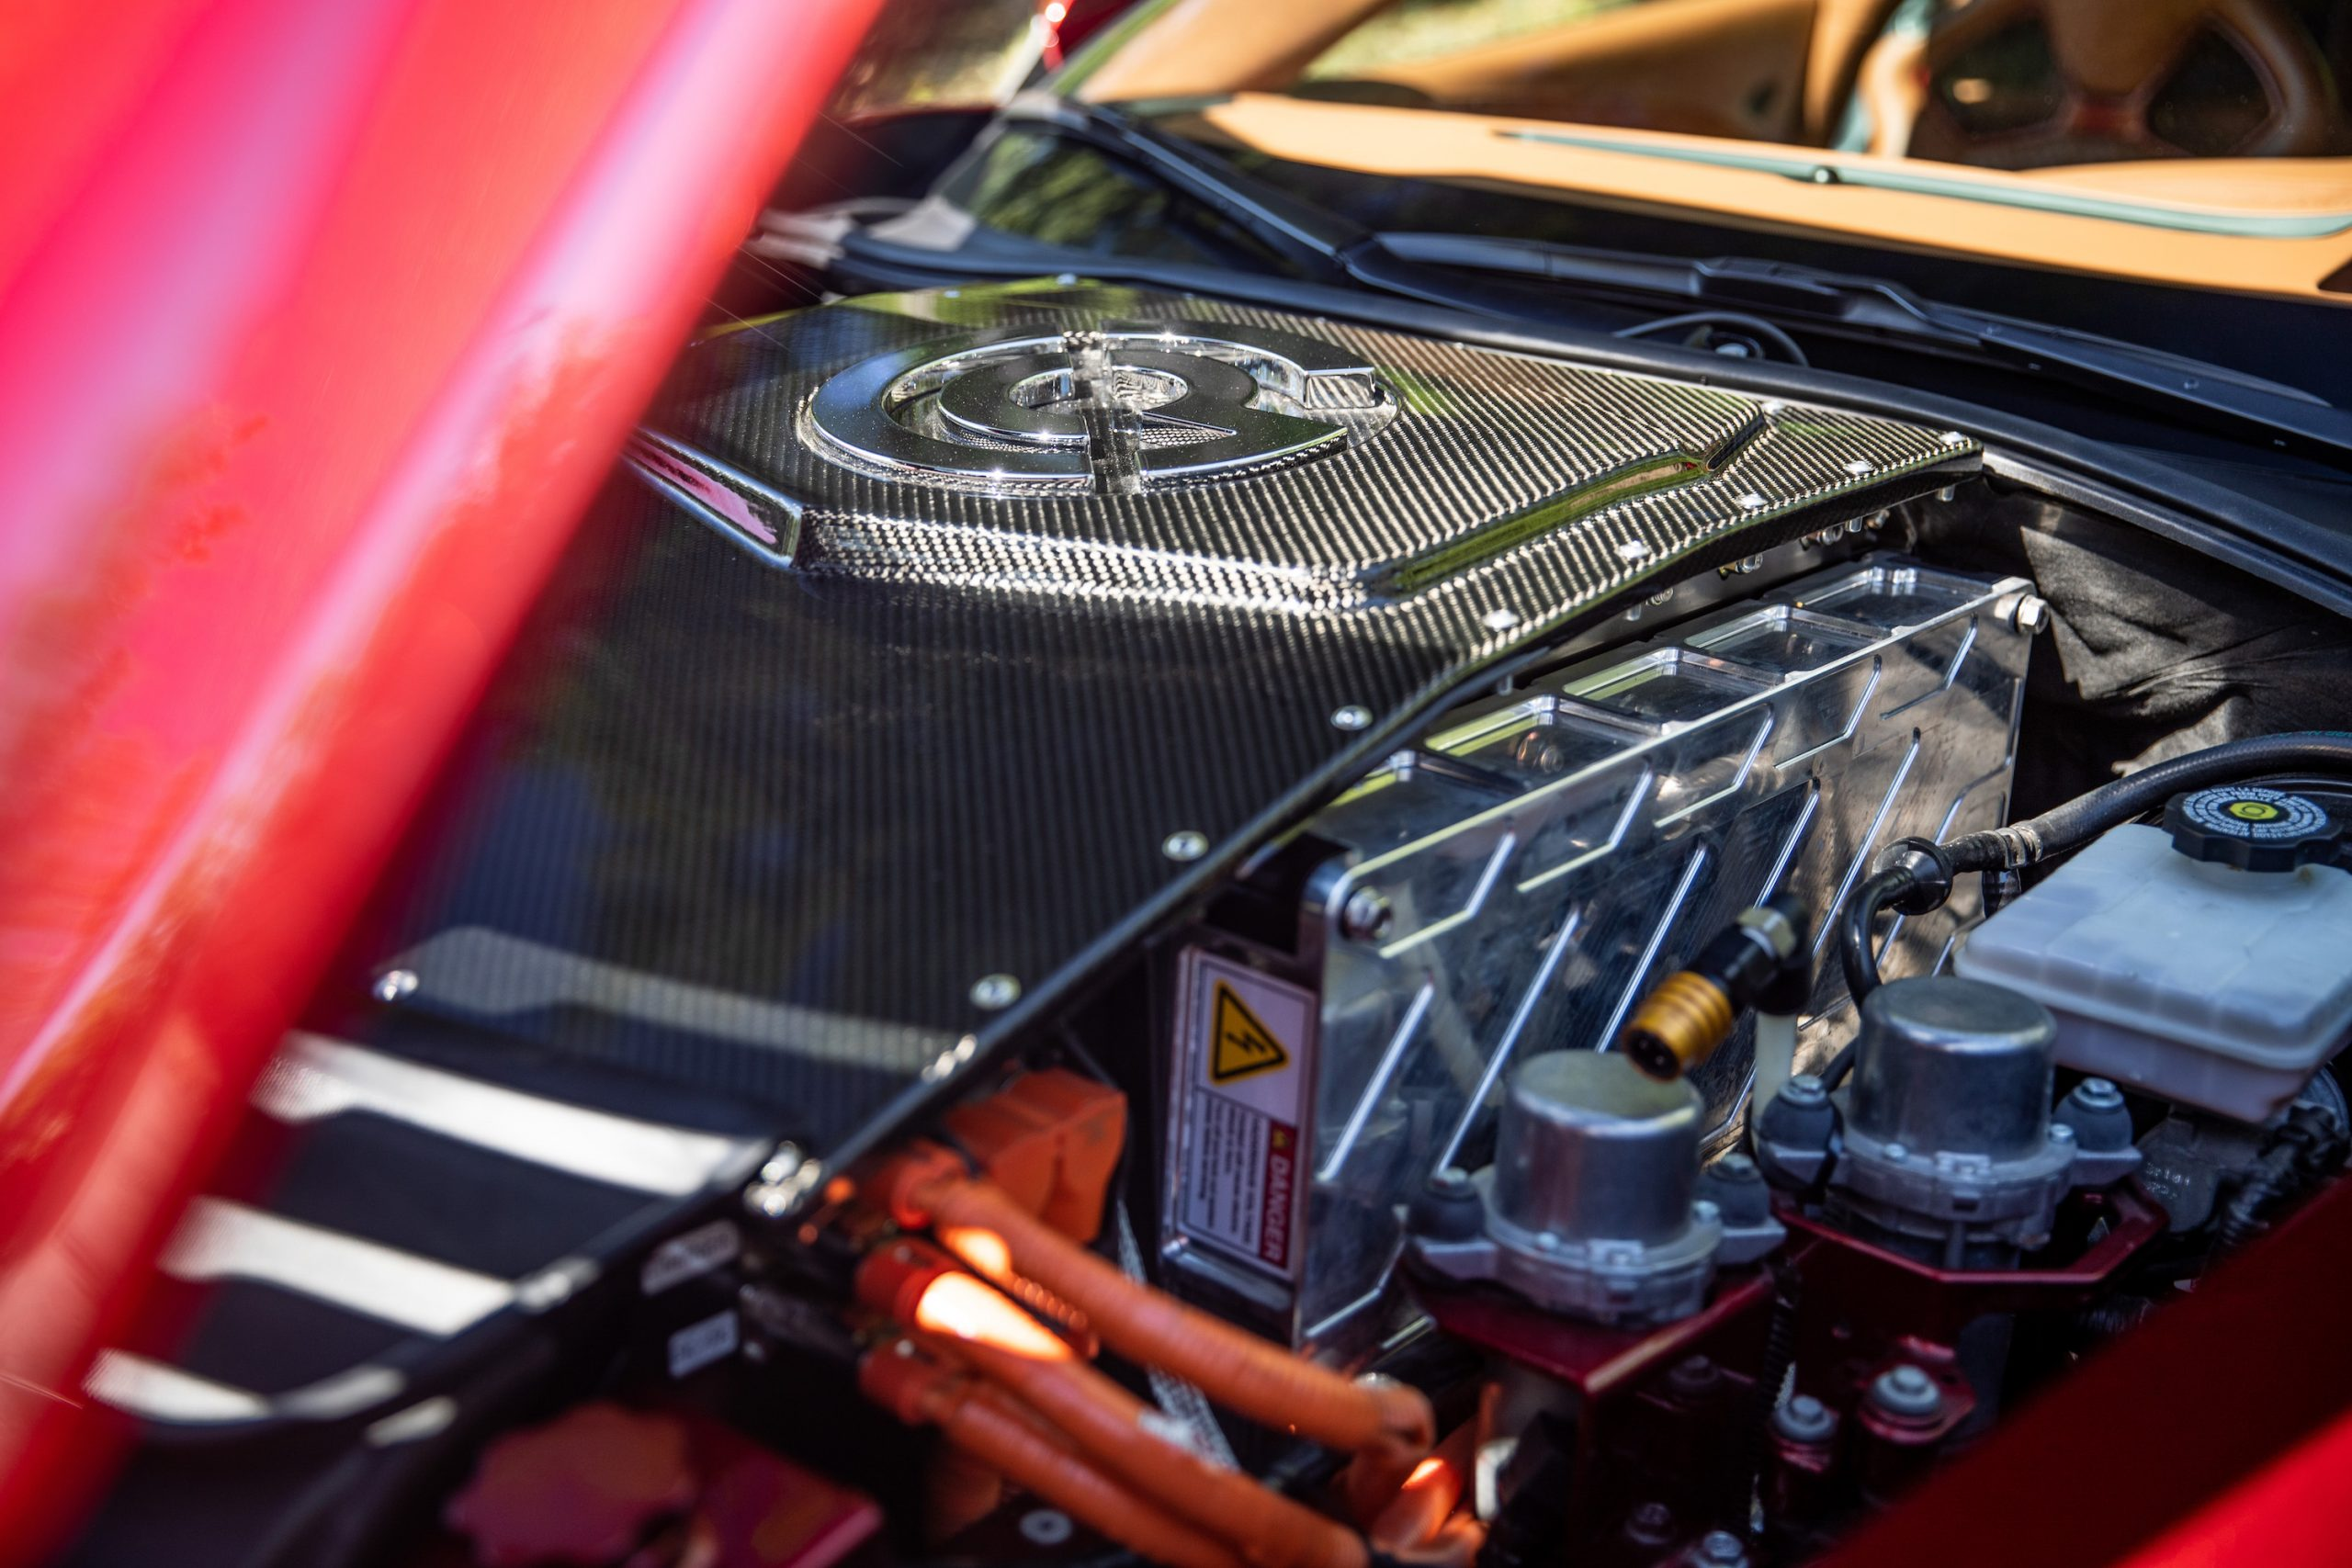 Genovation GXE C7 Corvette Engine Angle Close